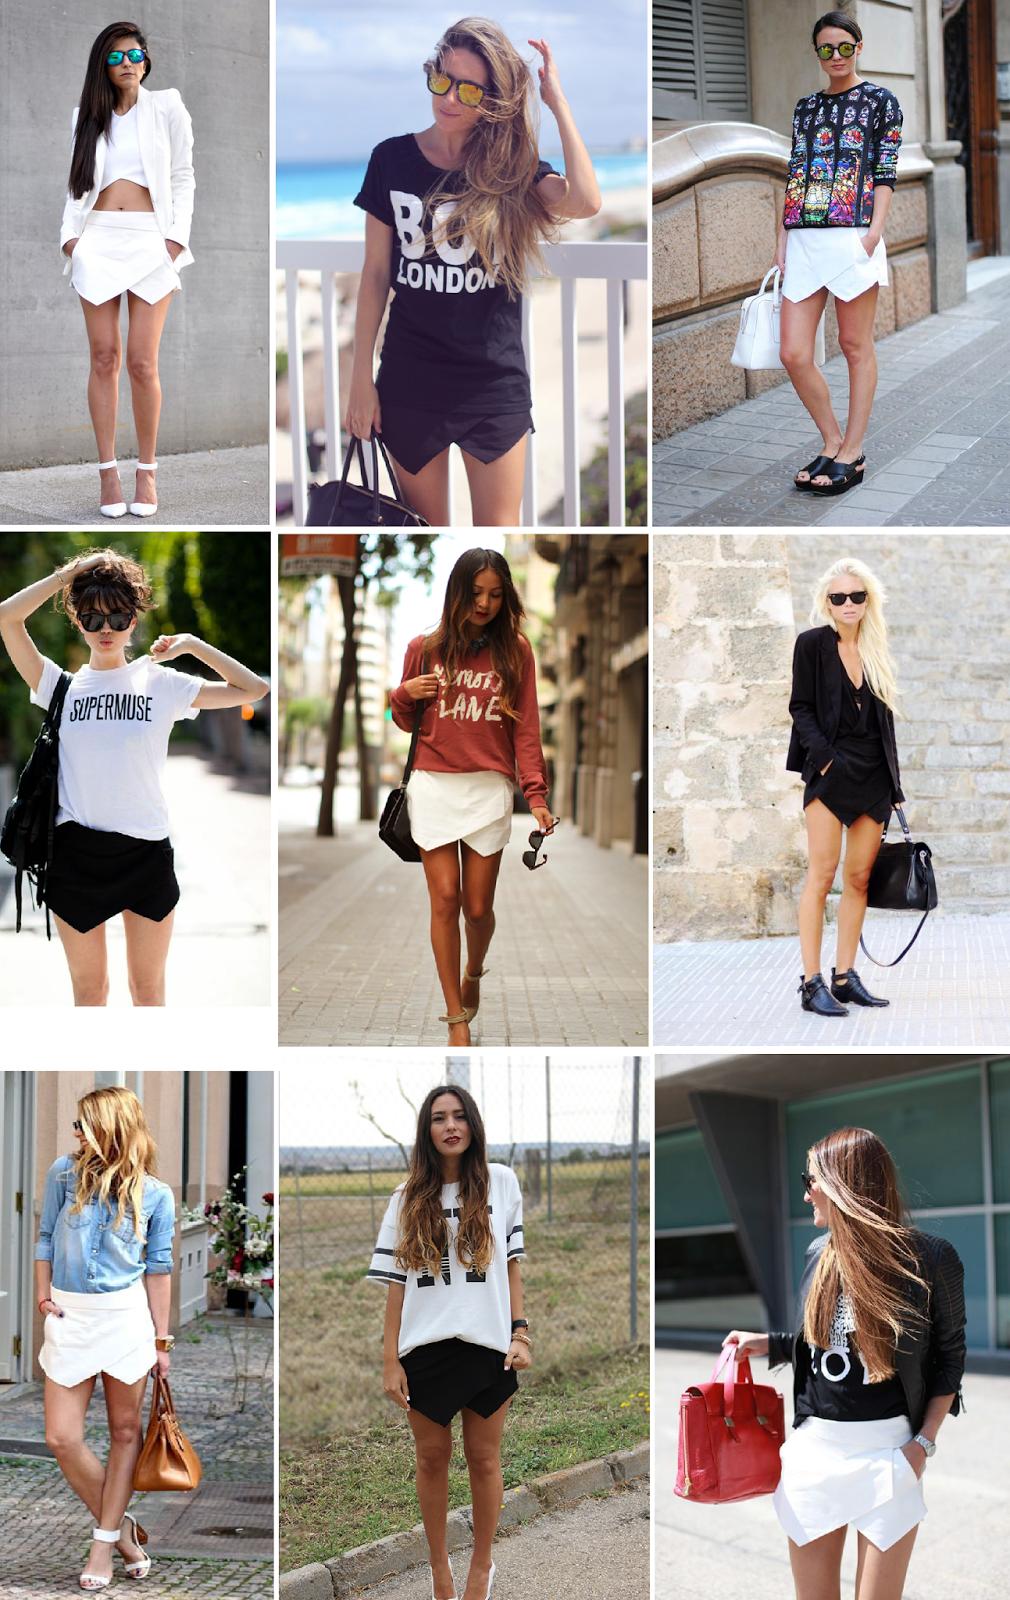 Copy bloggers